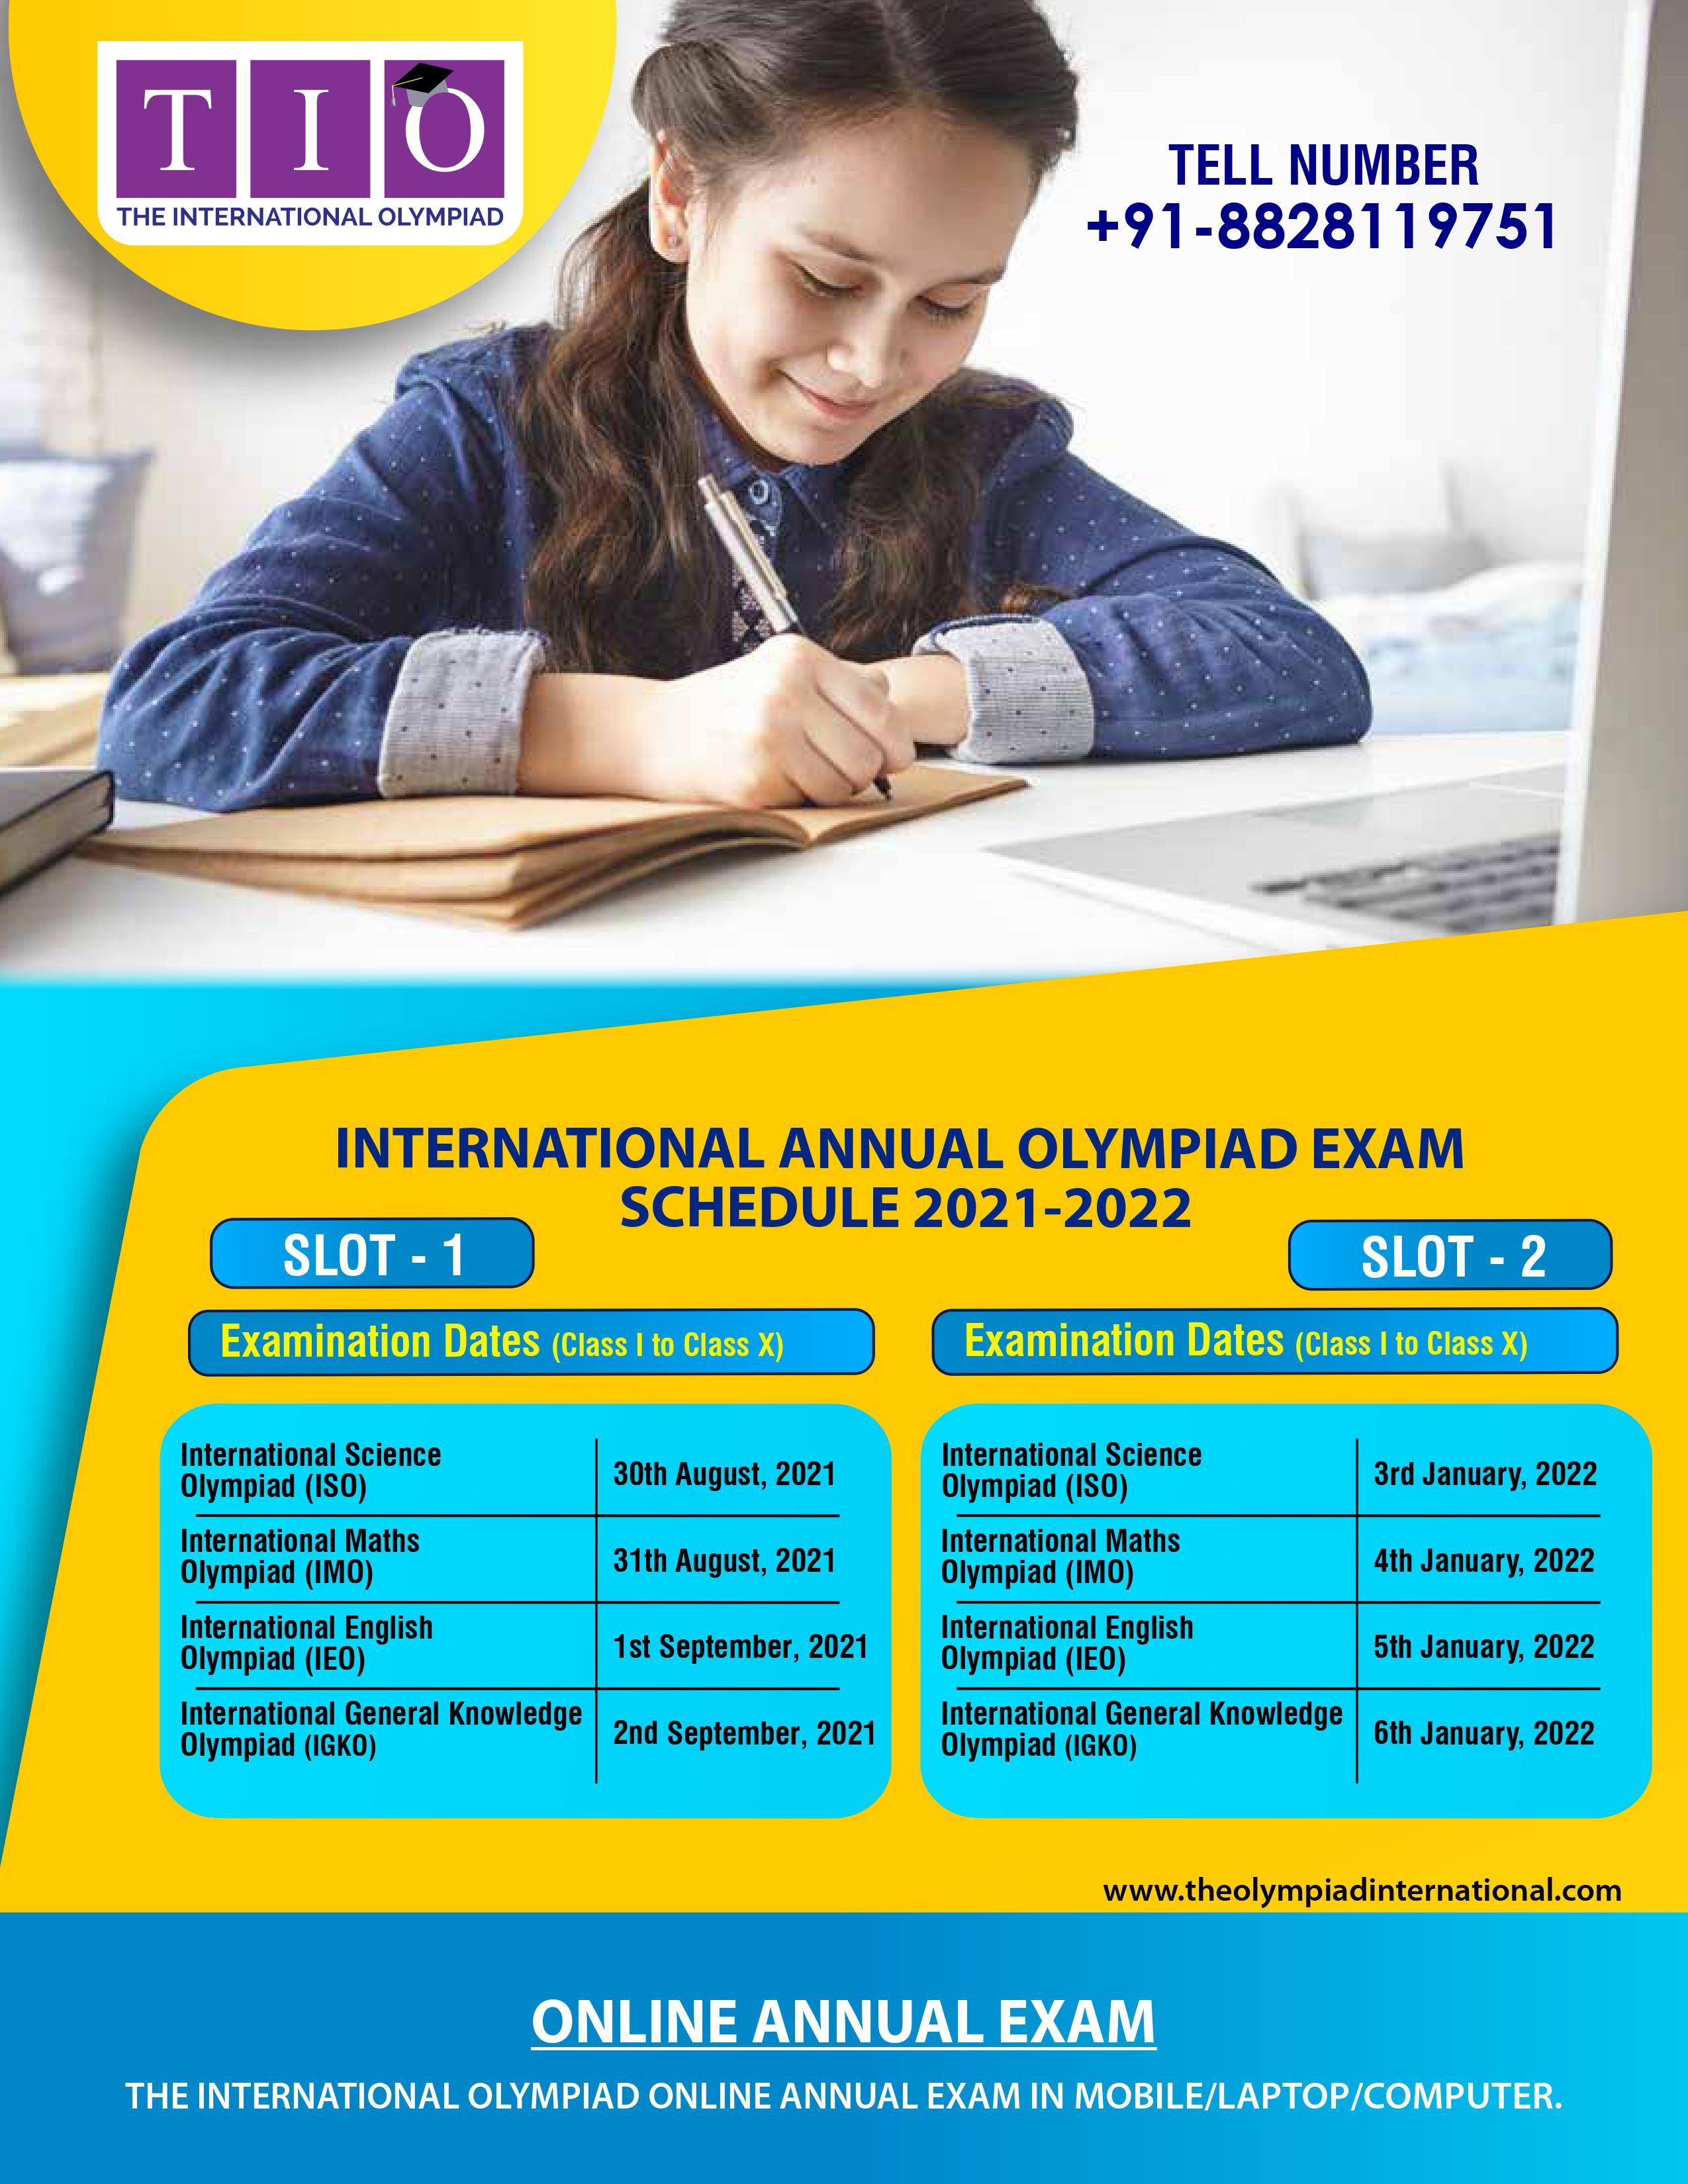 Annual Olympiad Schedule